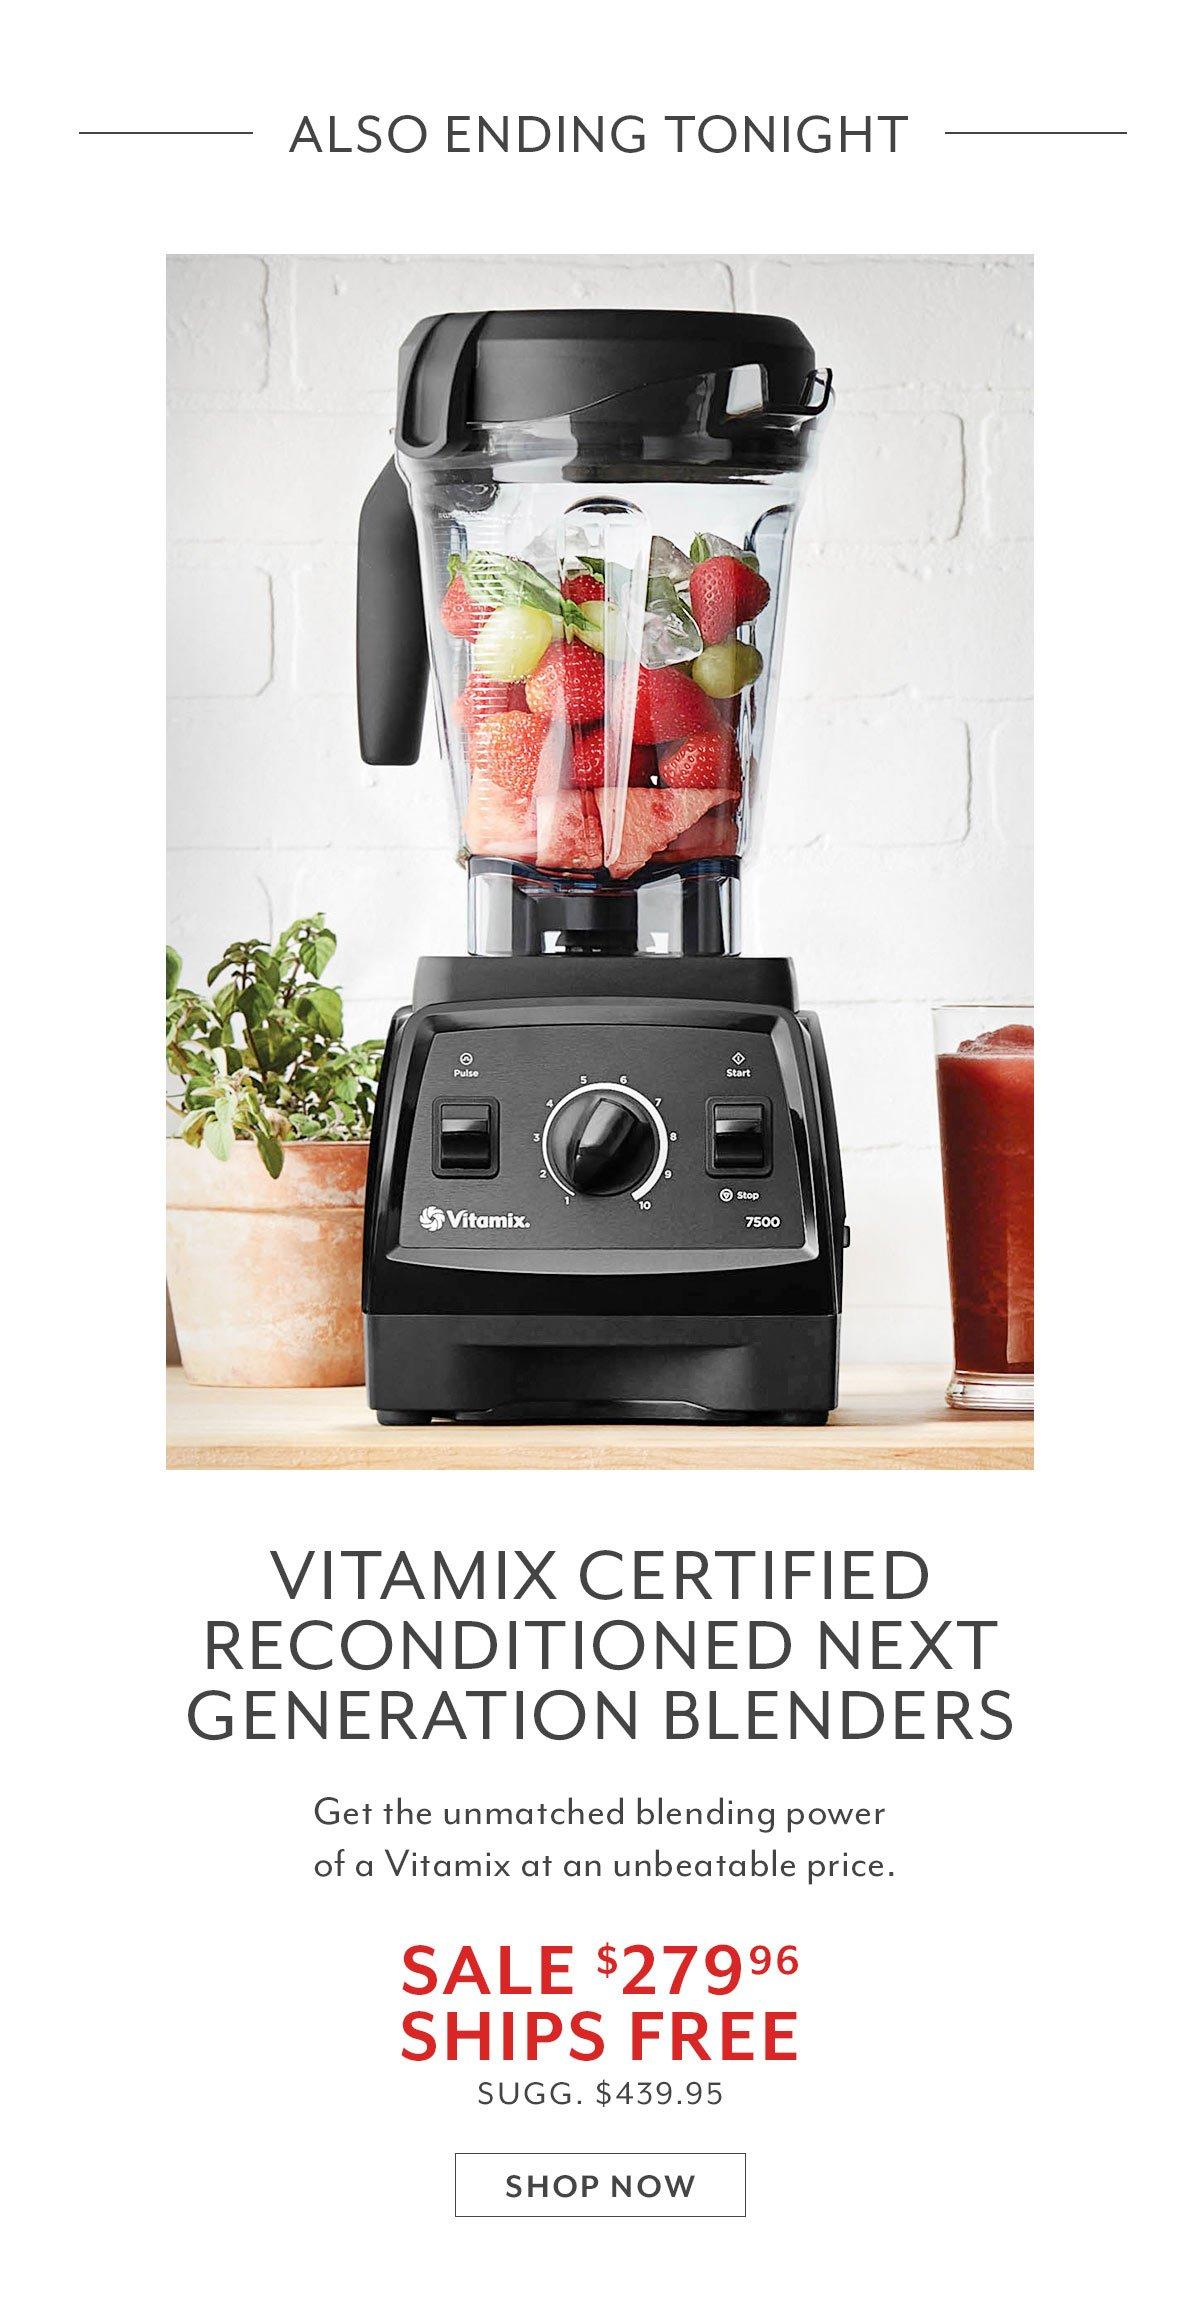 Vitamix Certified Reconditioned Next Generation Blenders